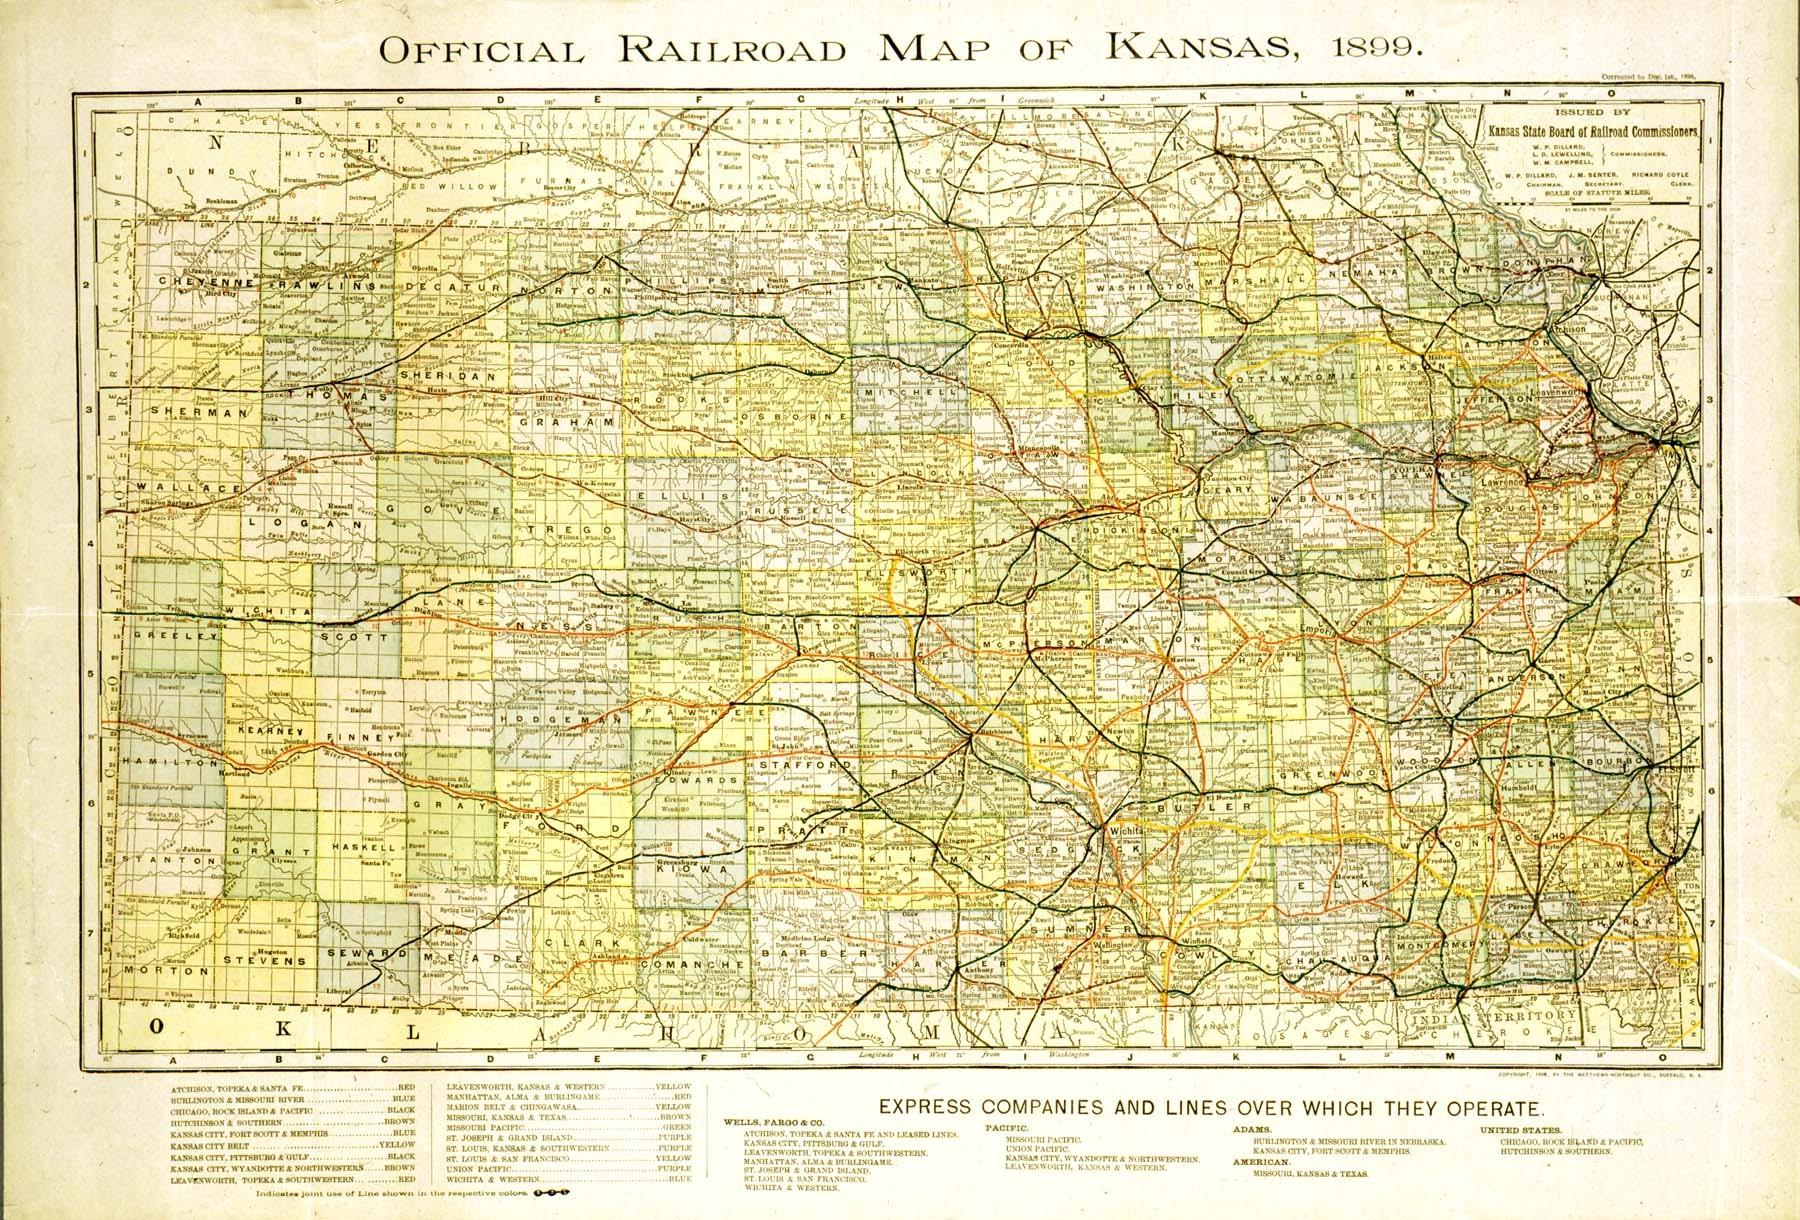 Official railroad map of Kansas 1899